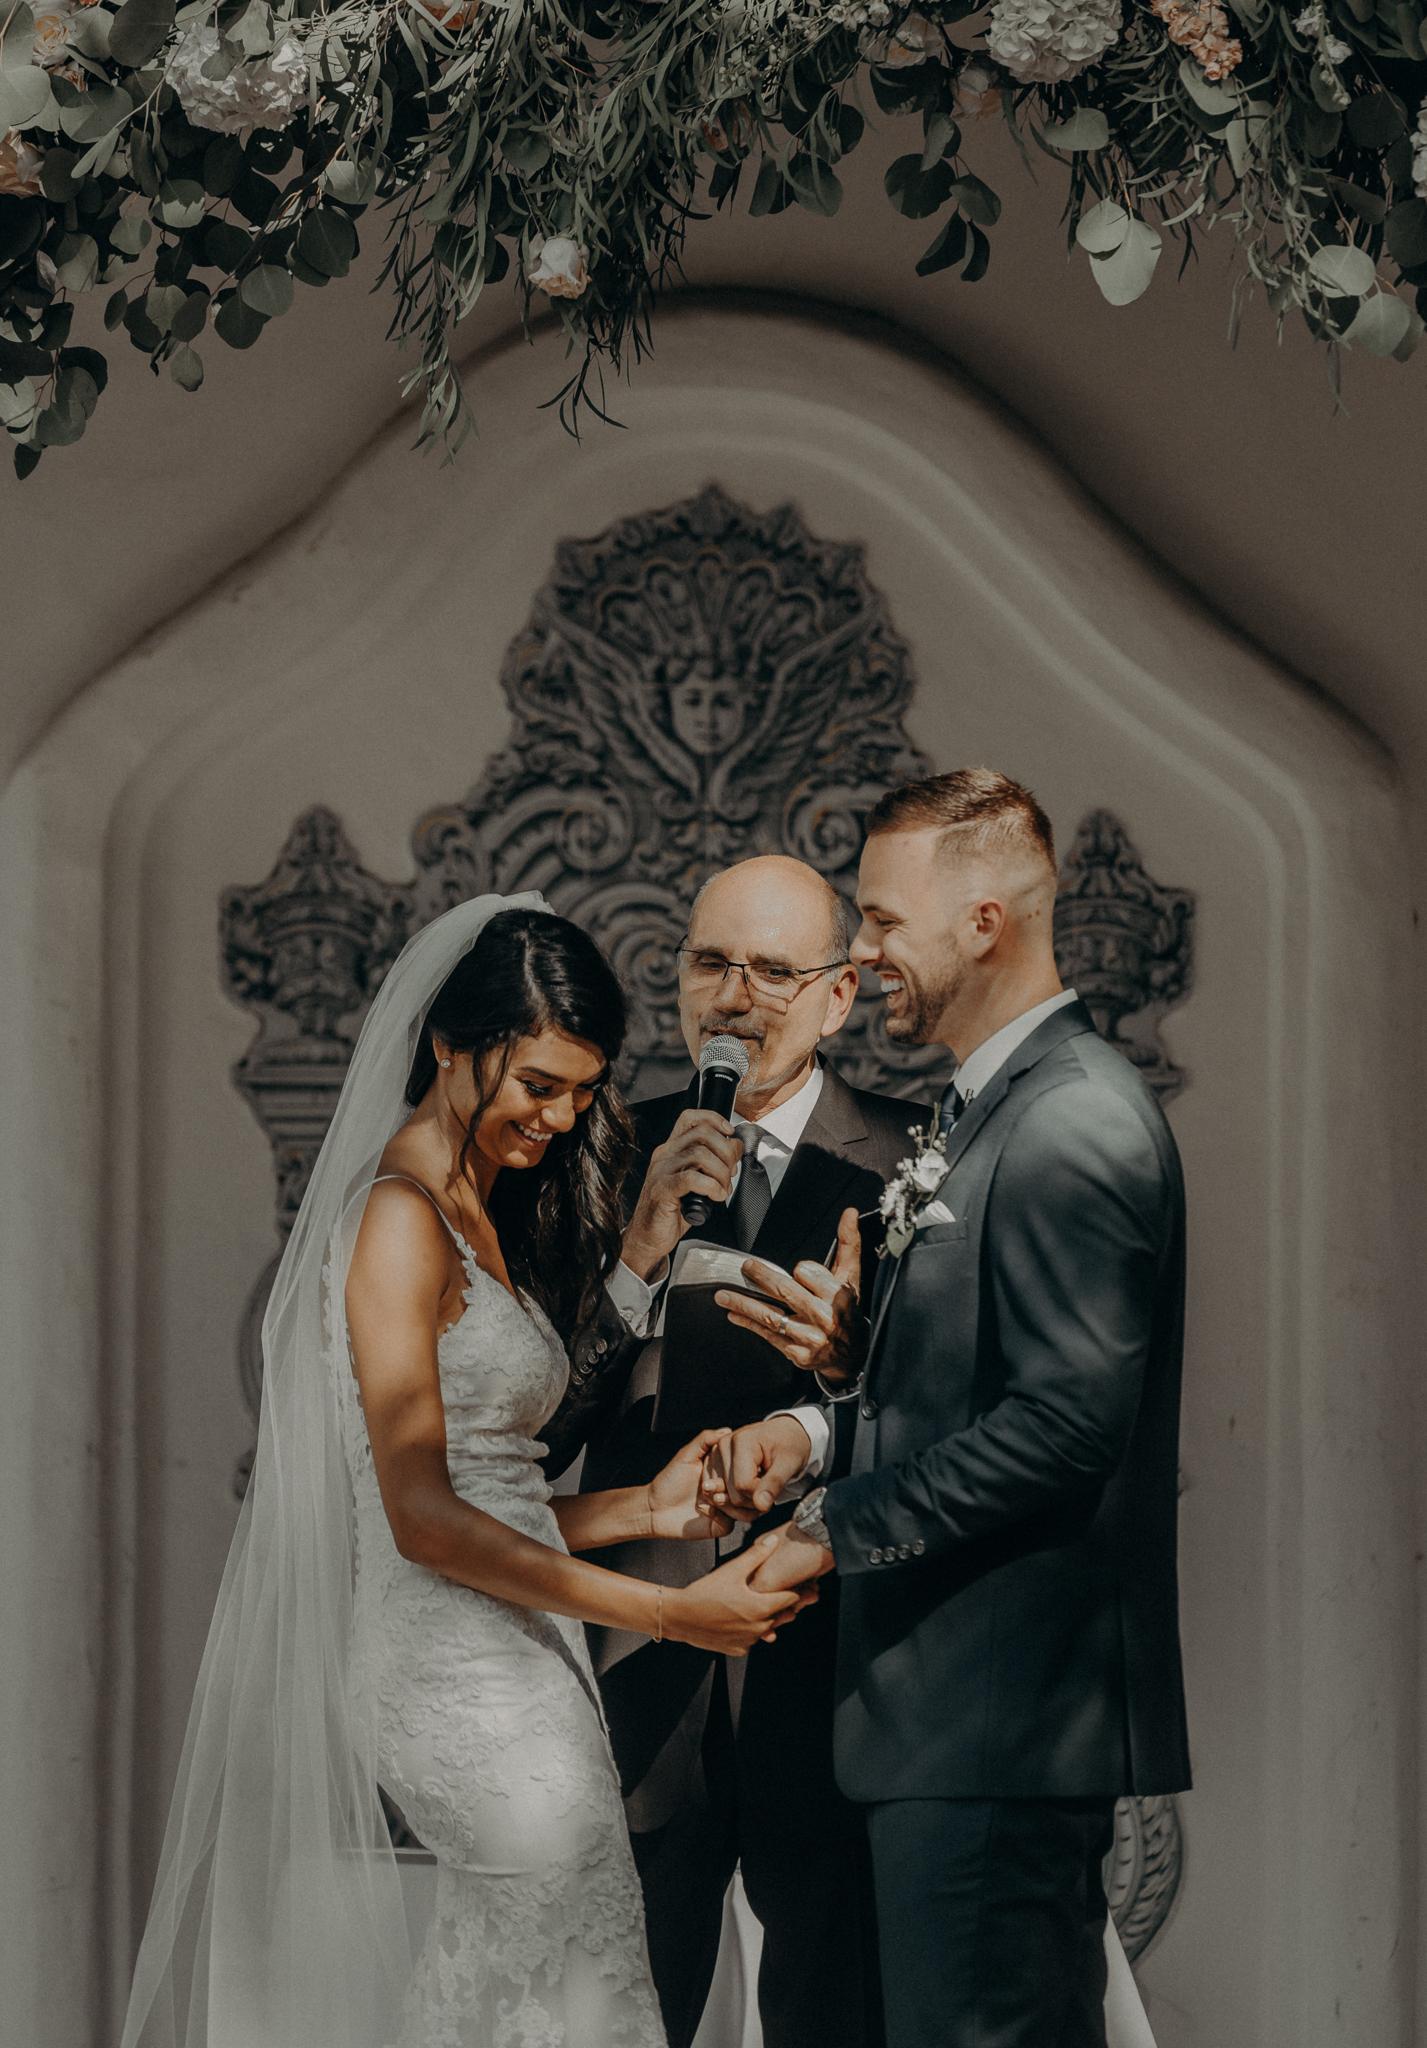 Isaiah + Taylor Photography - Rancho Las Lomas Wedding, Los Angeles Wedding Photographer-060.jpg